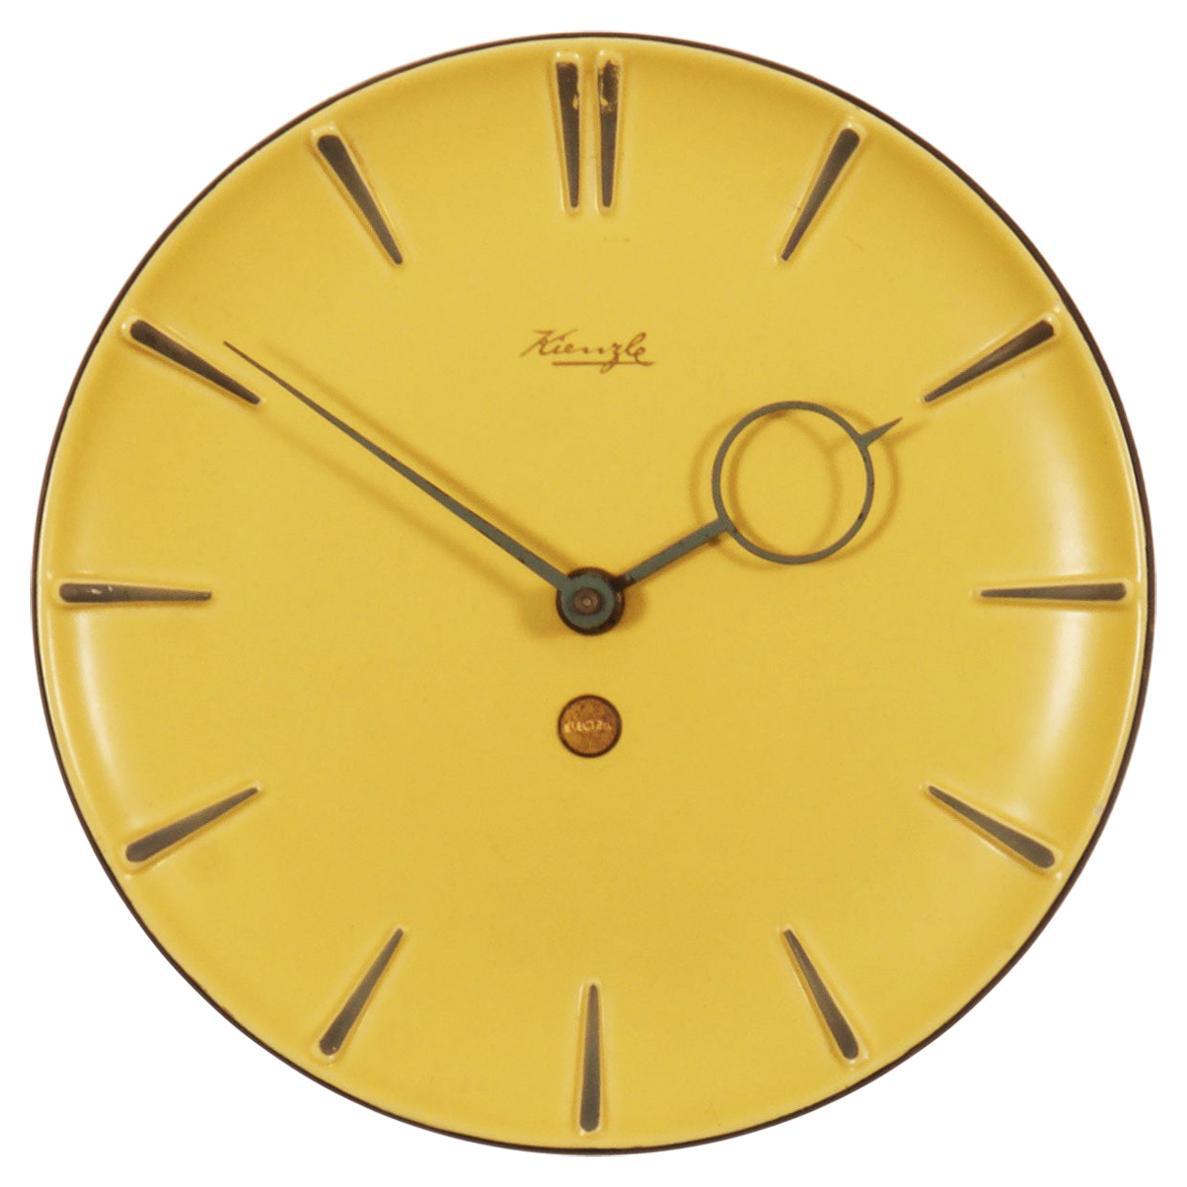 German Clocks - 270 For Sale at 1stdibs